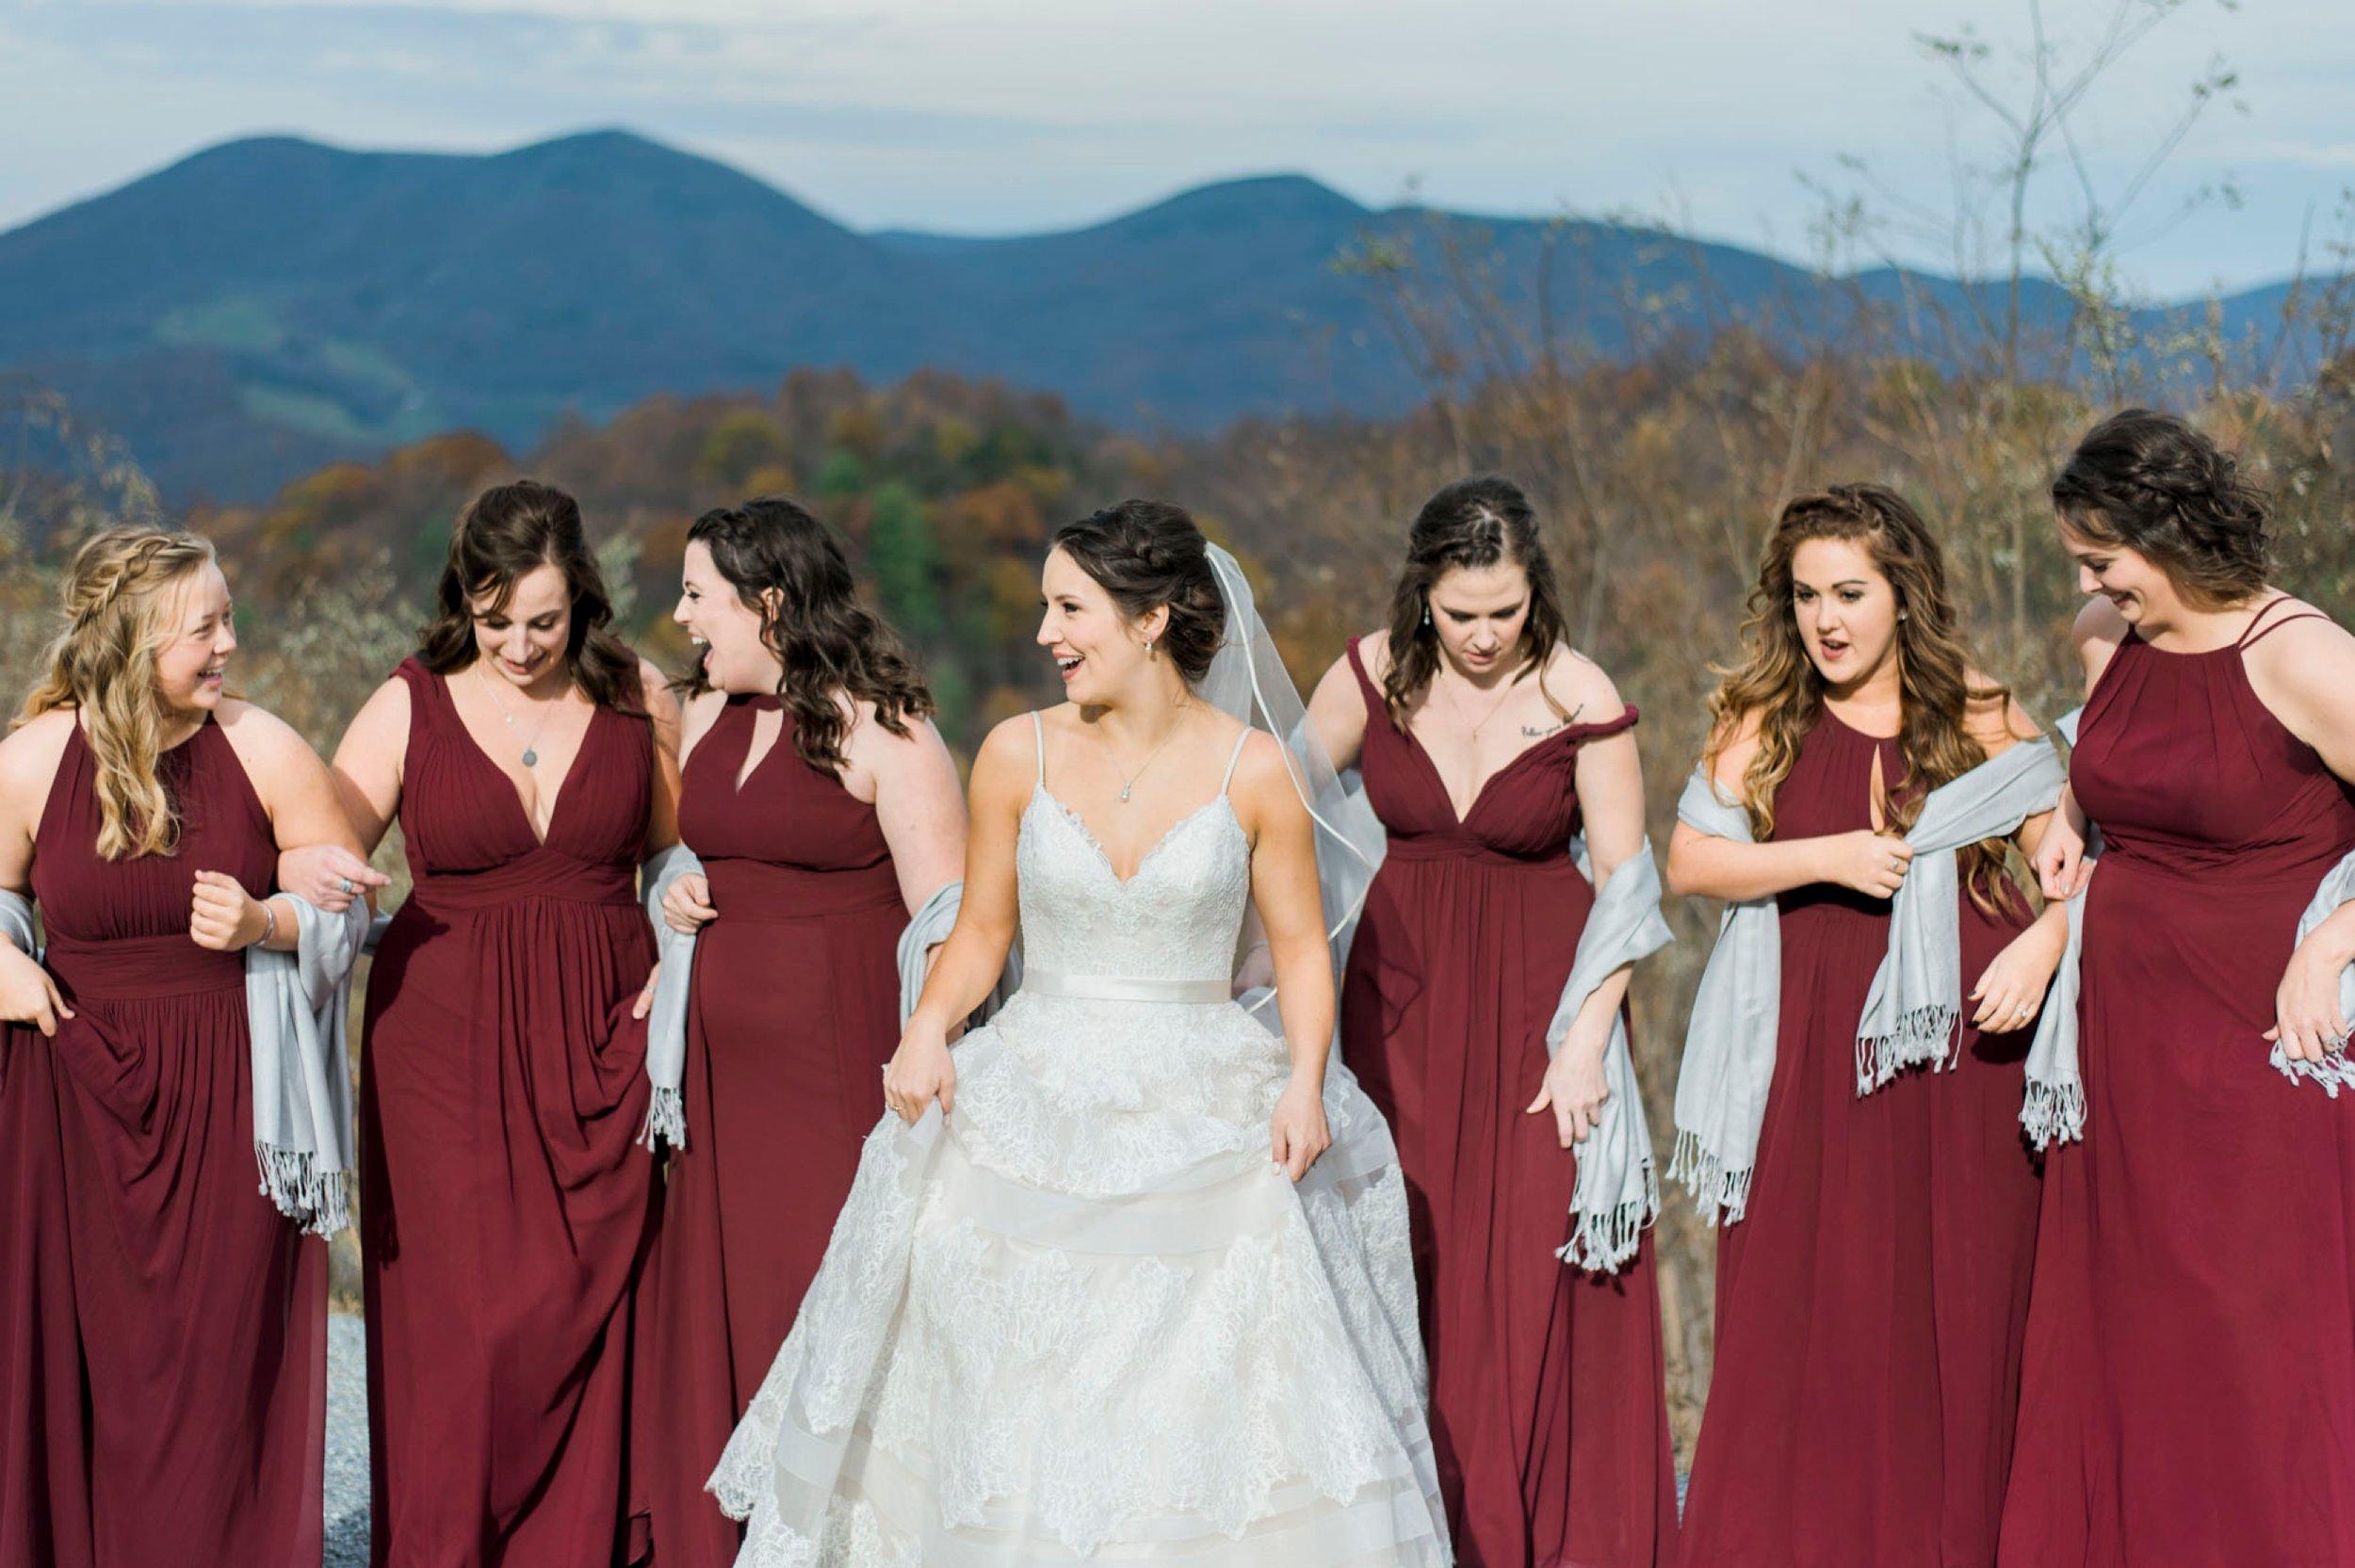 IrvineEstate_LexingtonVA_Wedding_FallWedding_VirginiaWeddingPhotographer 50.jpg